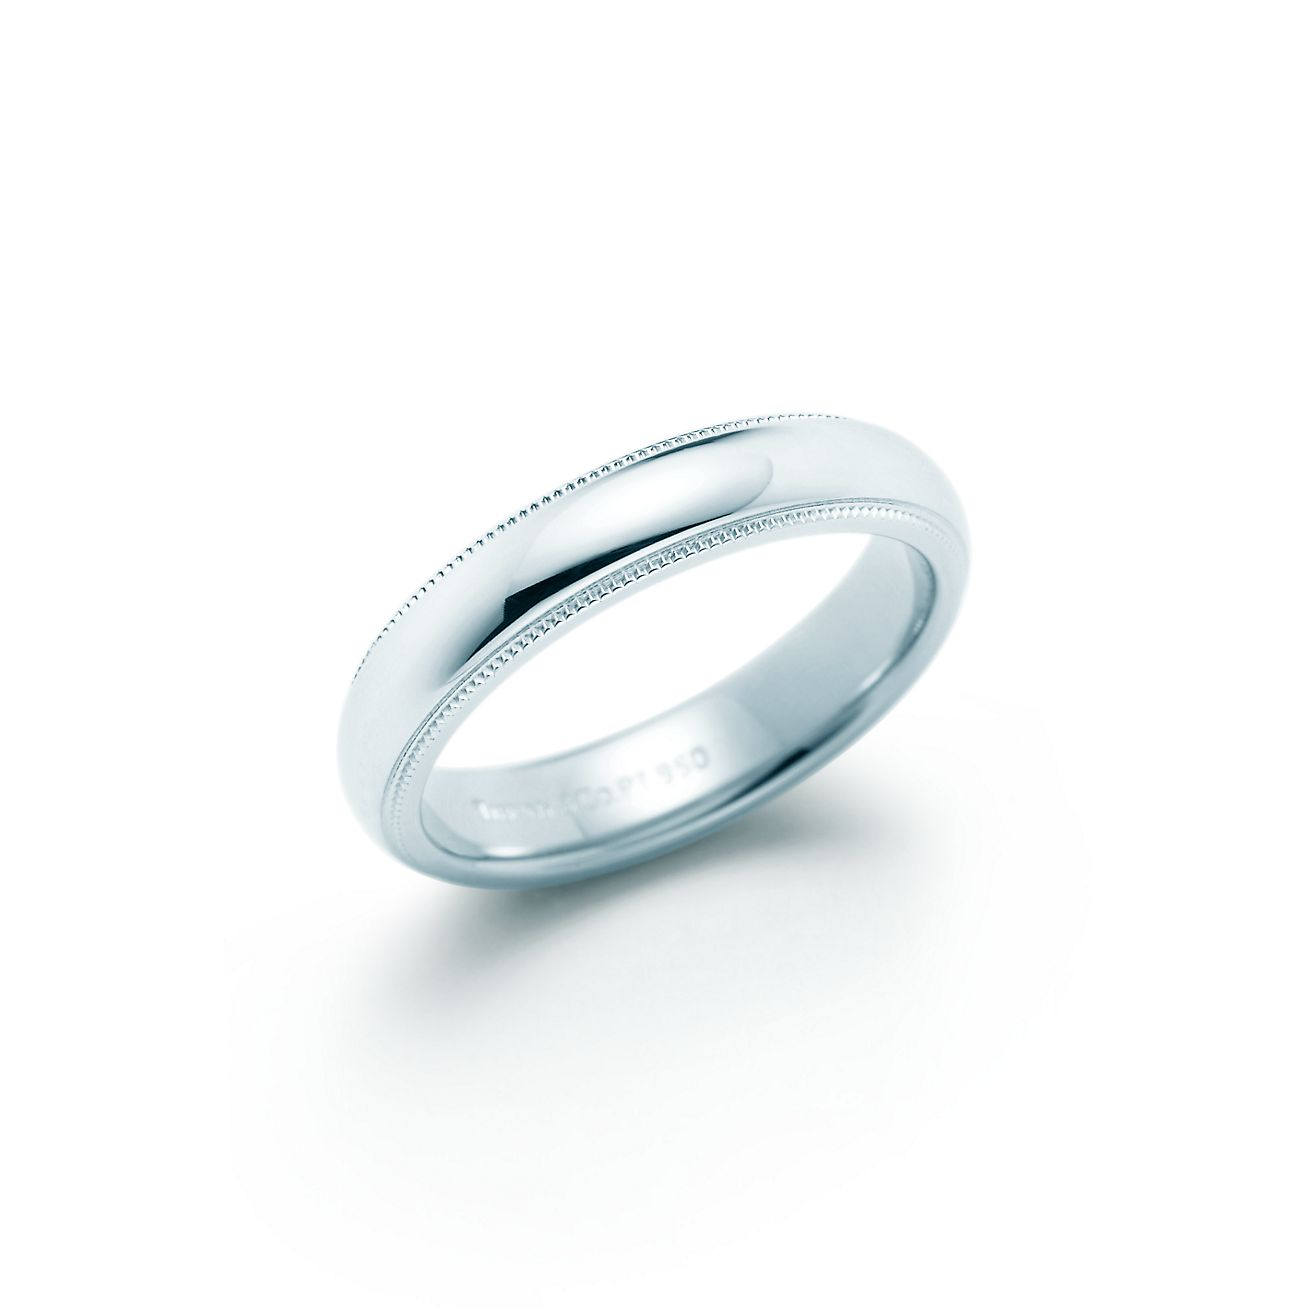 Milgrain wedding band ring in platinum 4mm wide Tiffany Co